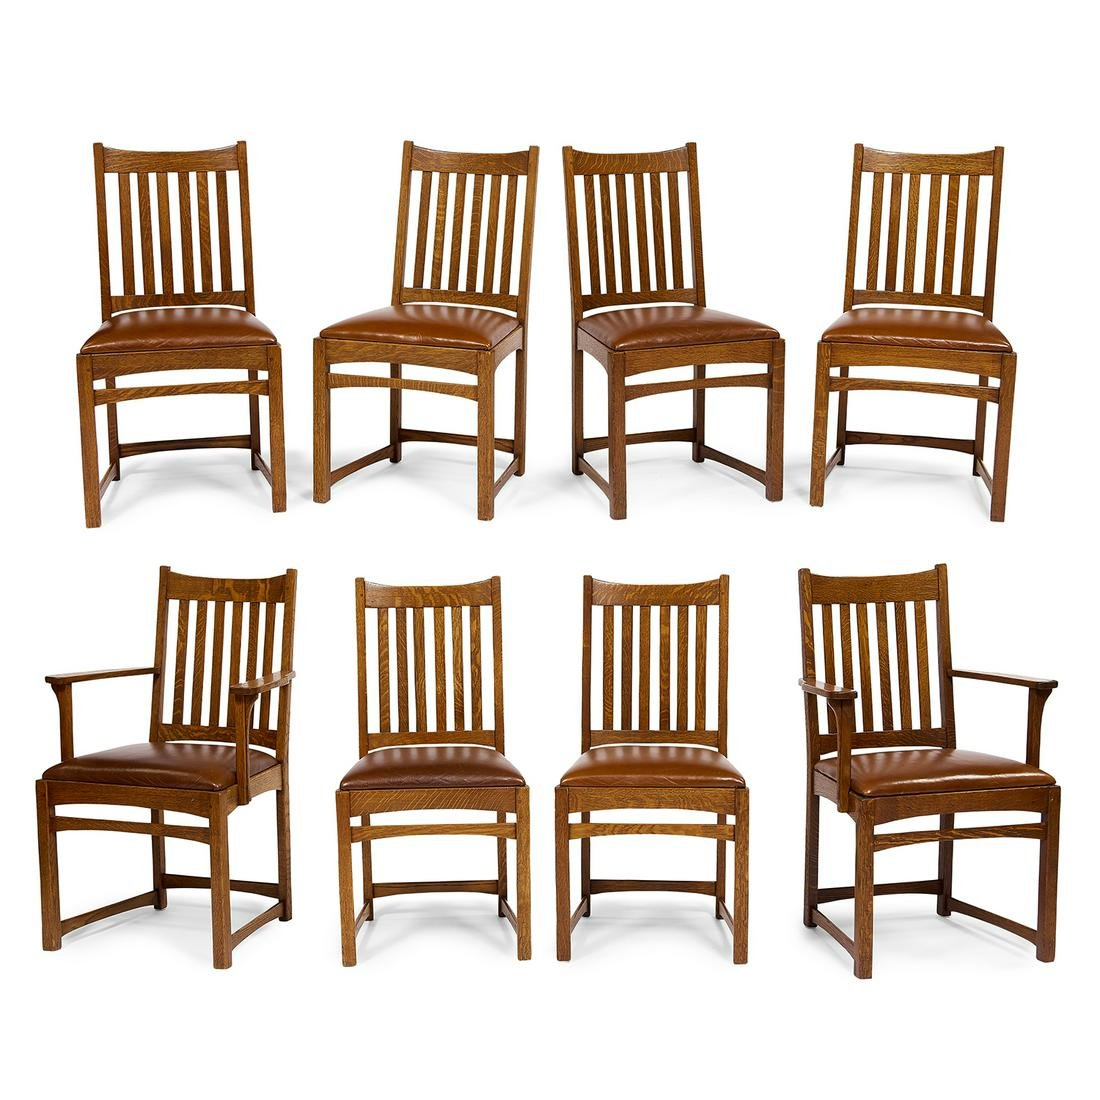 Lifetime Puritan Motif dining chairs set of eight